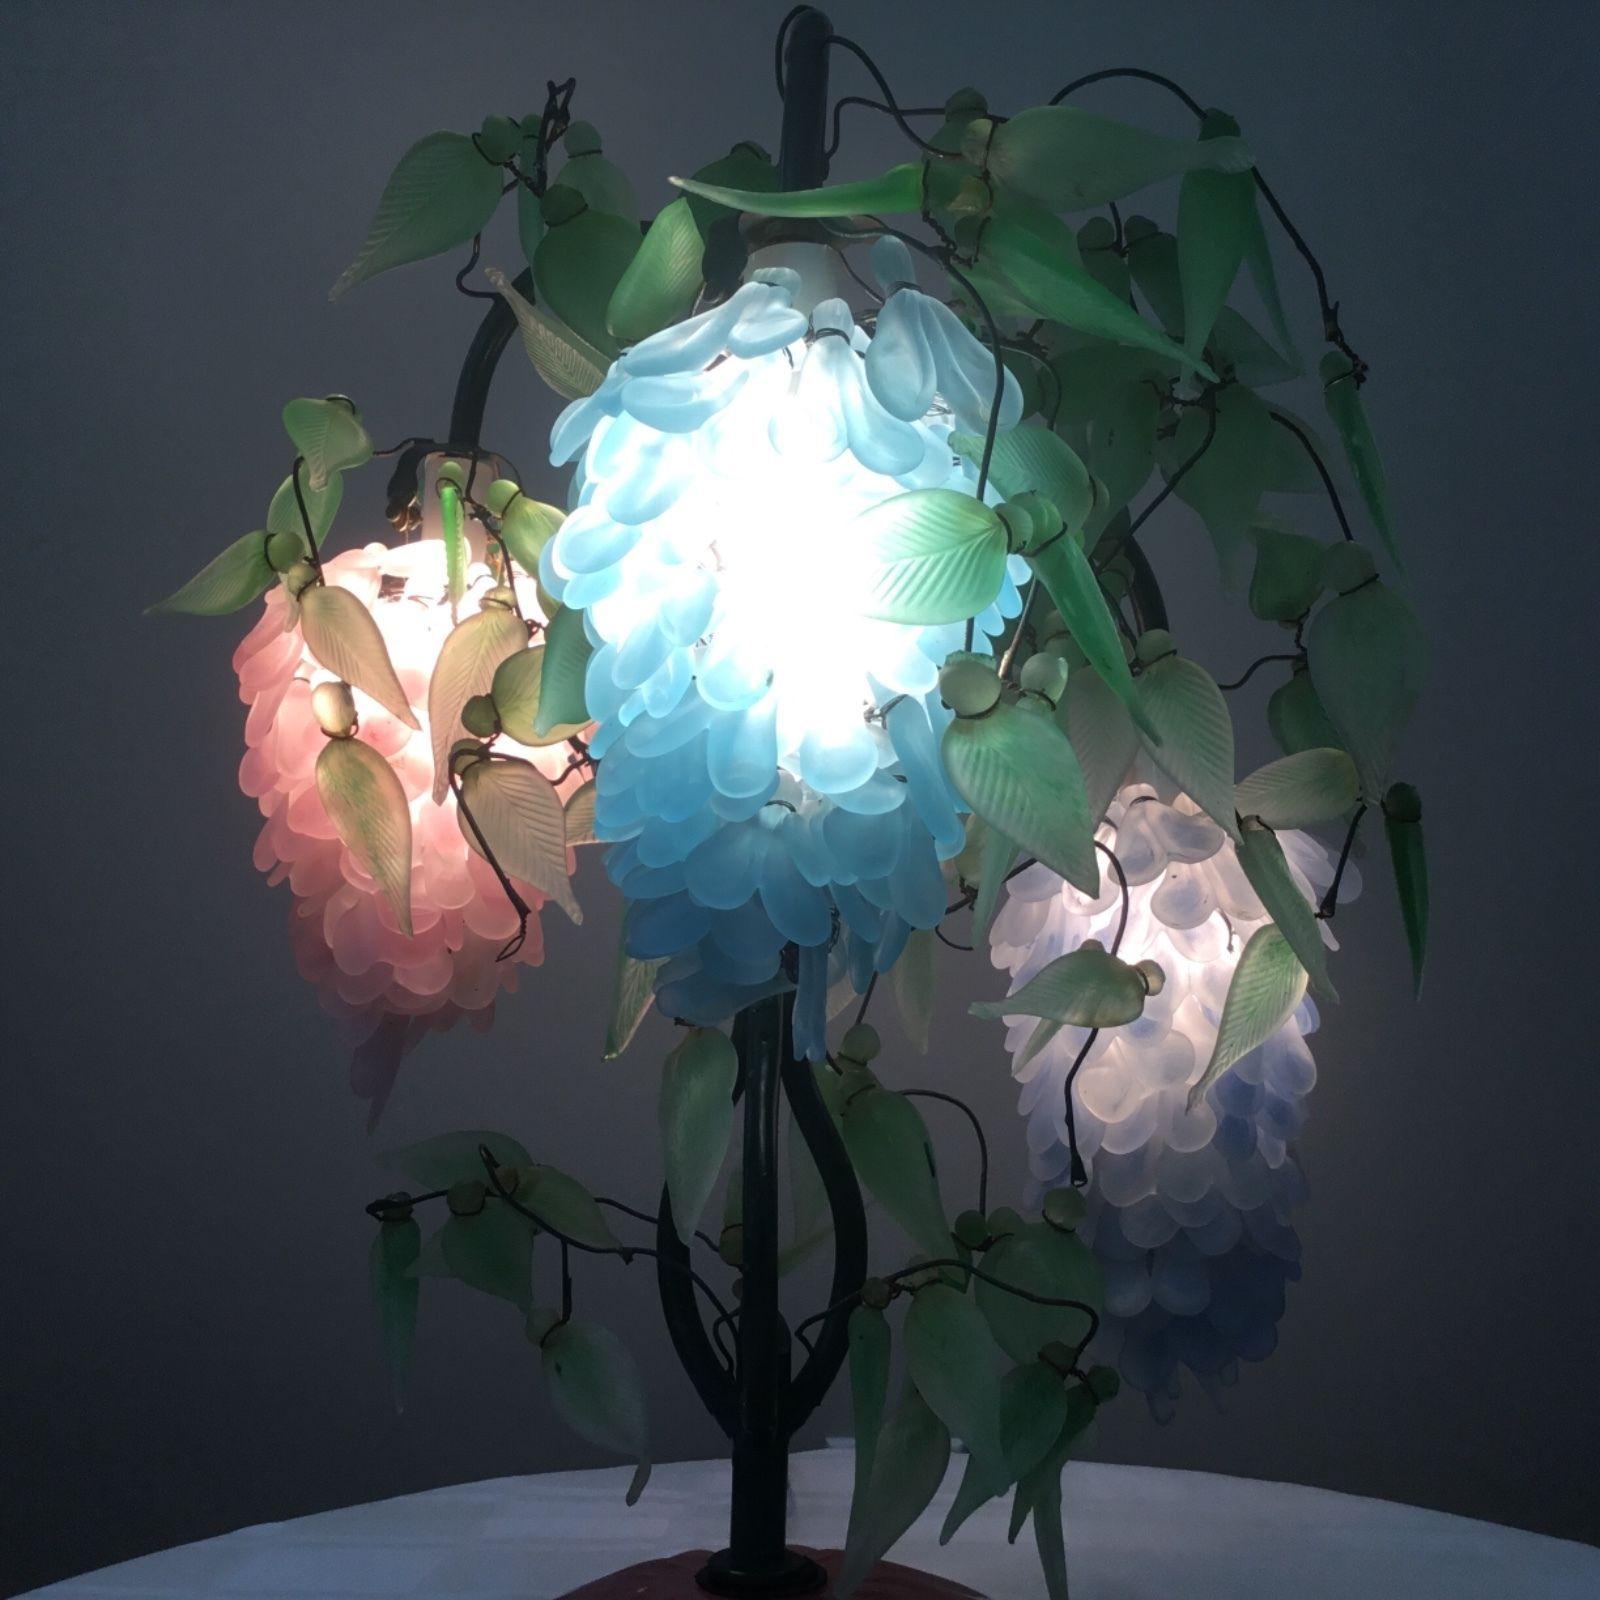 Murano Wisteria Glass Beaded Flower Shade Chandelier Lamp Like Grape Cluster Lamp Chandelier Lamp Wisteria Design